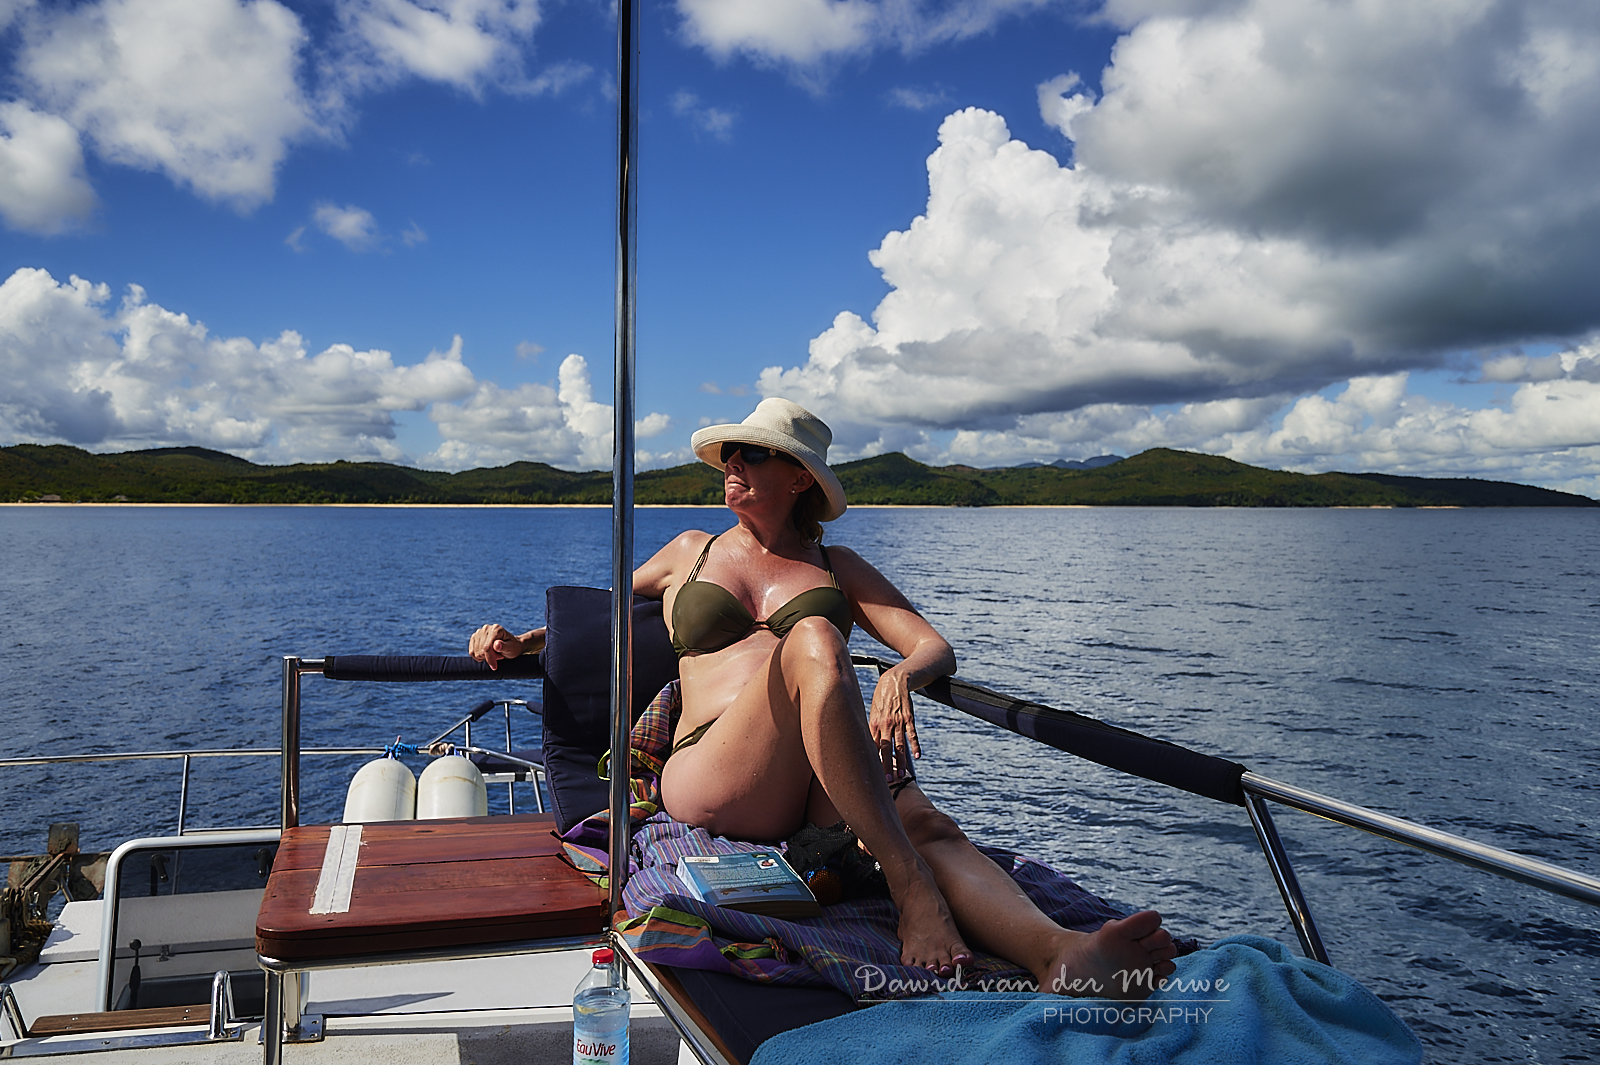 Enjoying the sun on a boat charter trip in Madagascar